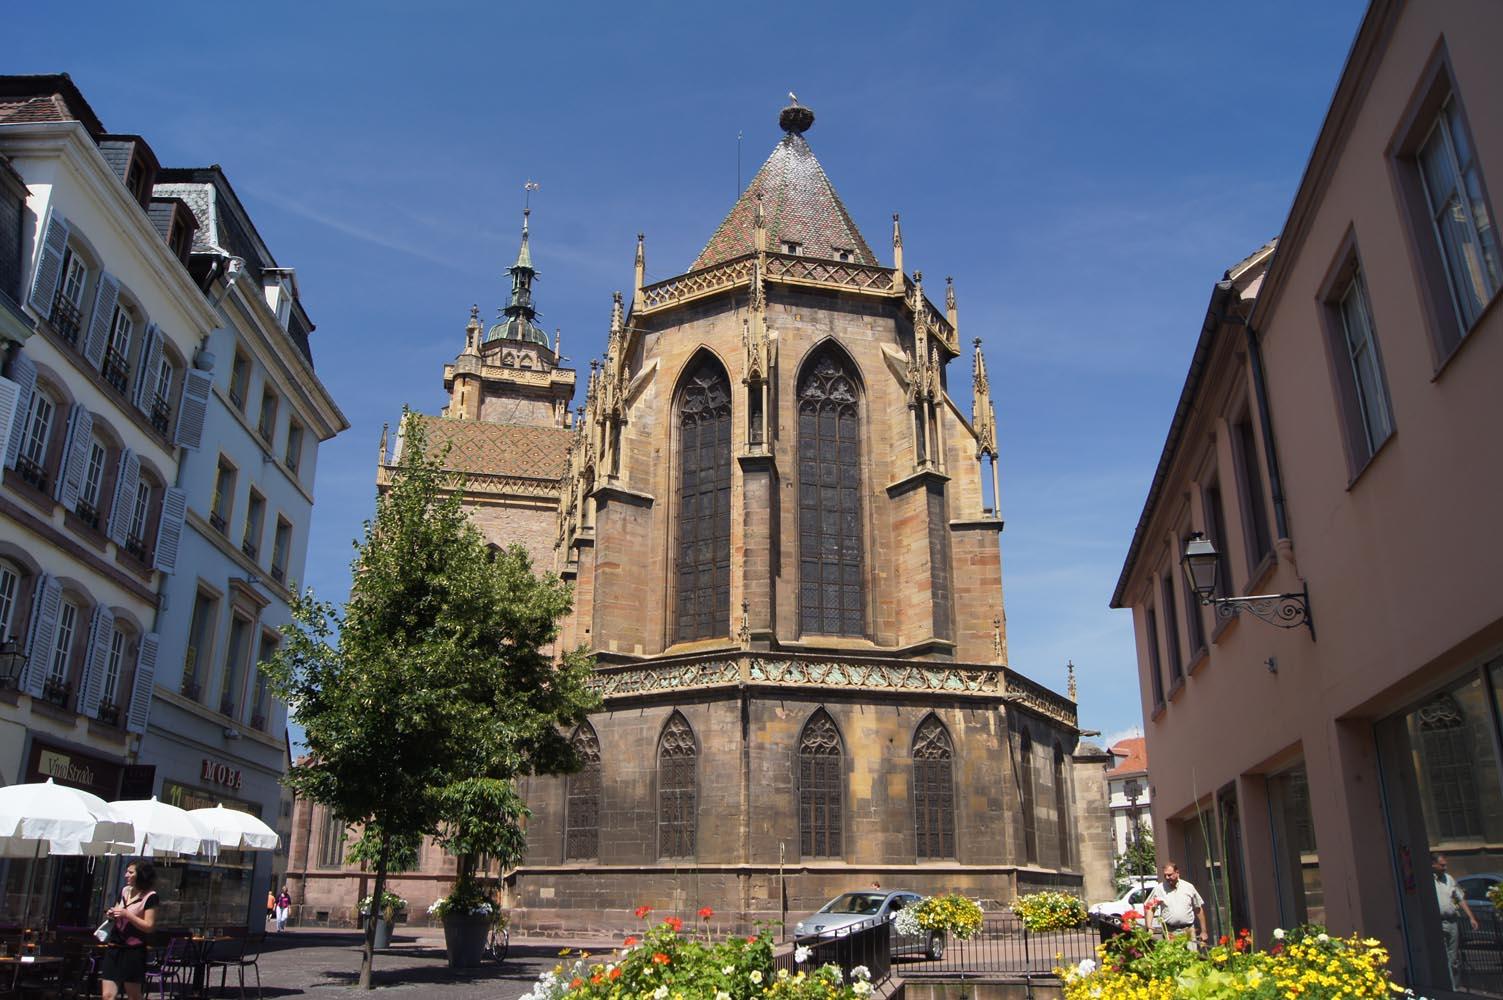 Colmar alsace france tourist office saint martin church for Colmar pictures